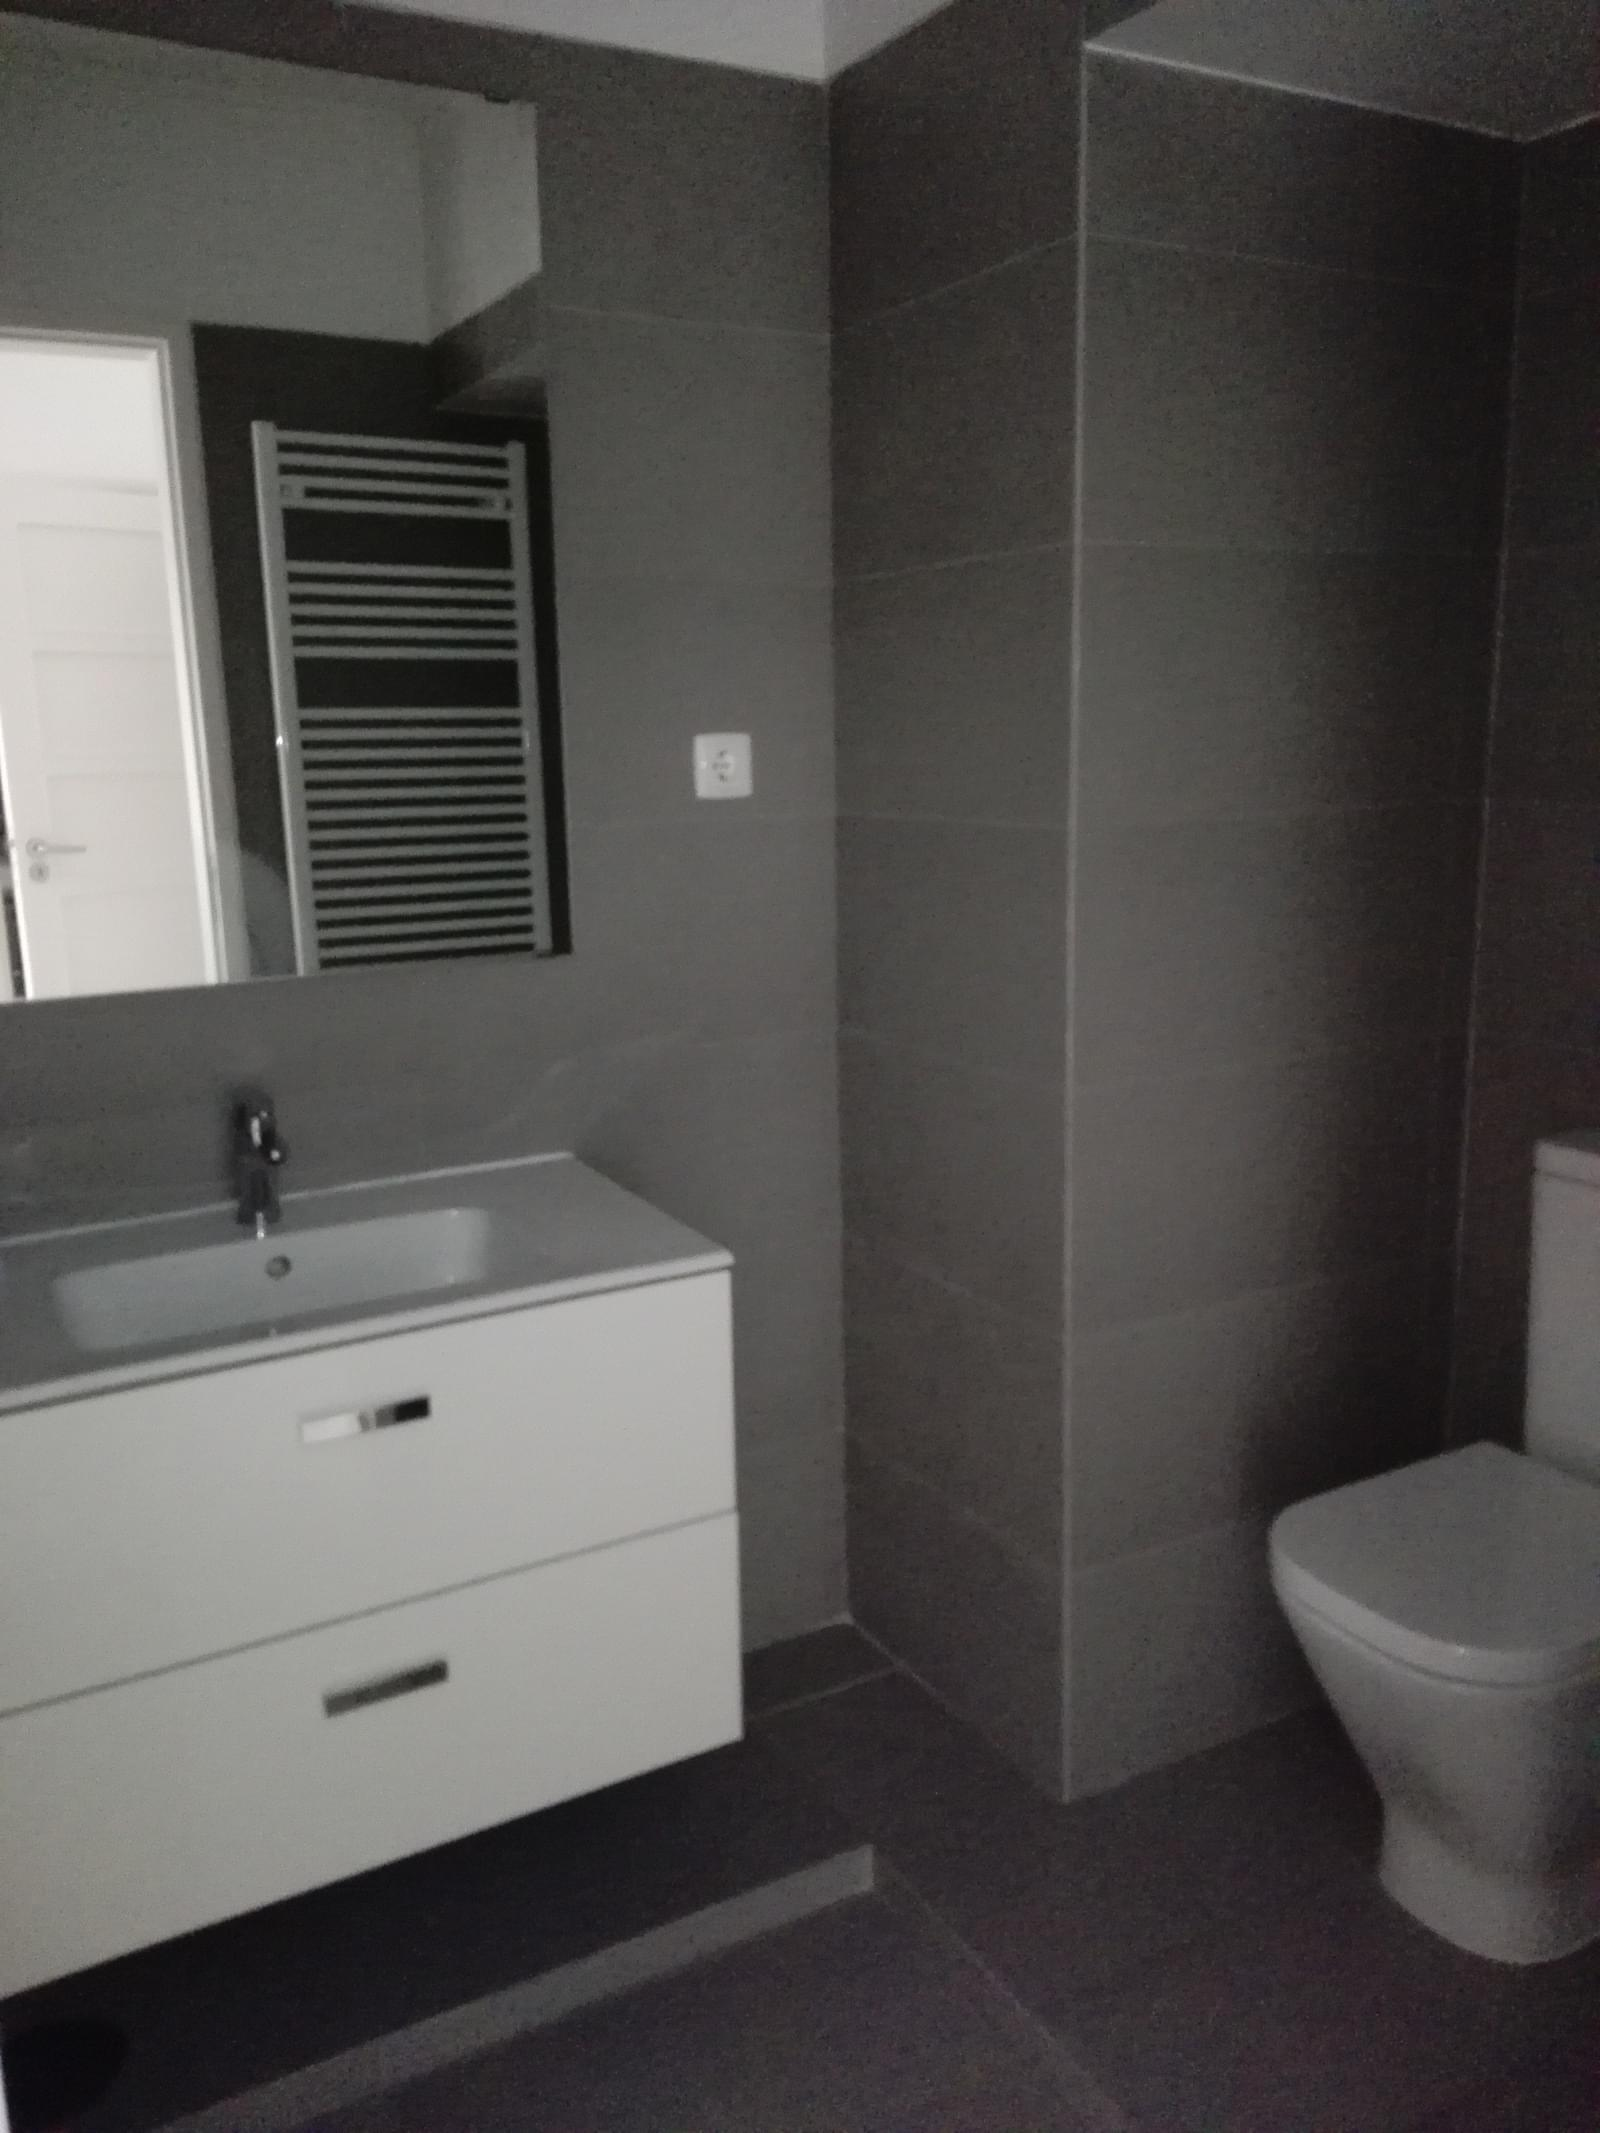 pf17056-apartamento-t4-1-lisboa-39fe6086-4b34-4524-b18d-2e8f5bae99a3